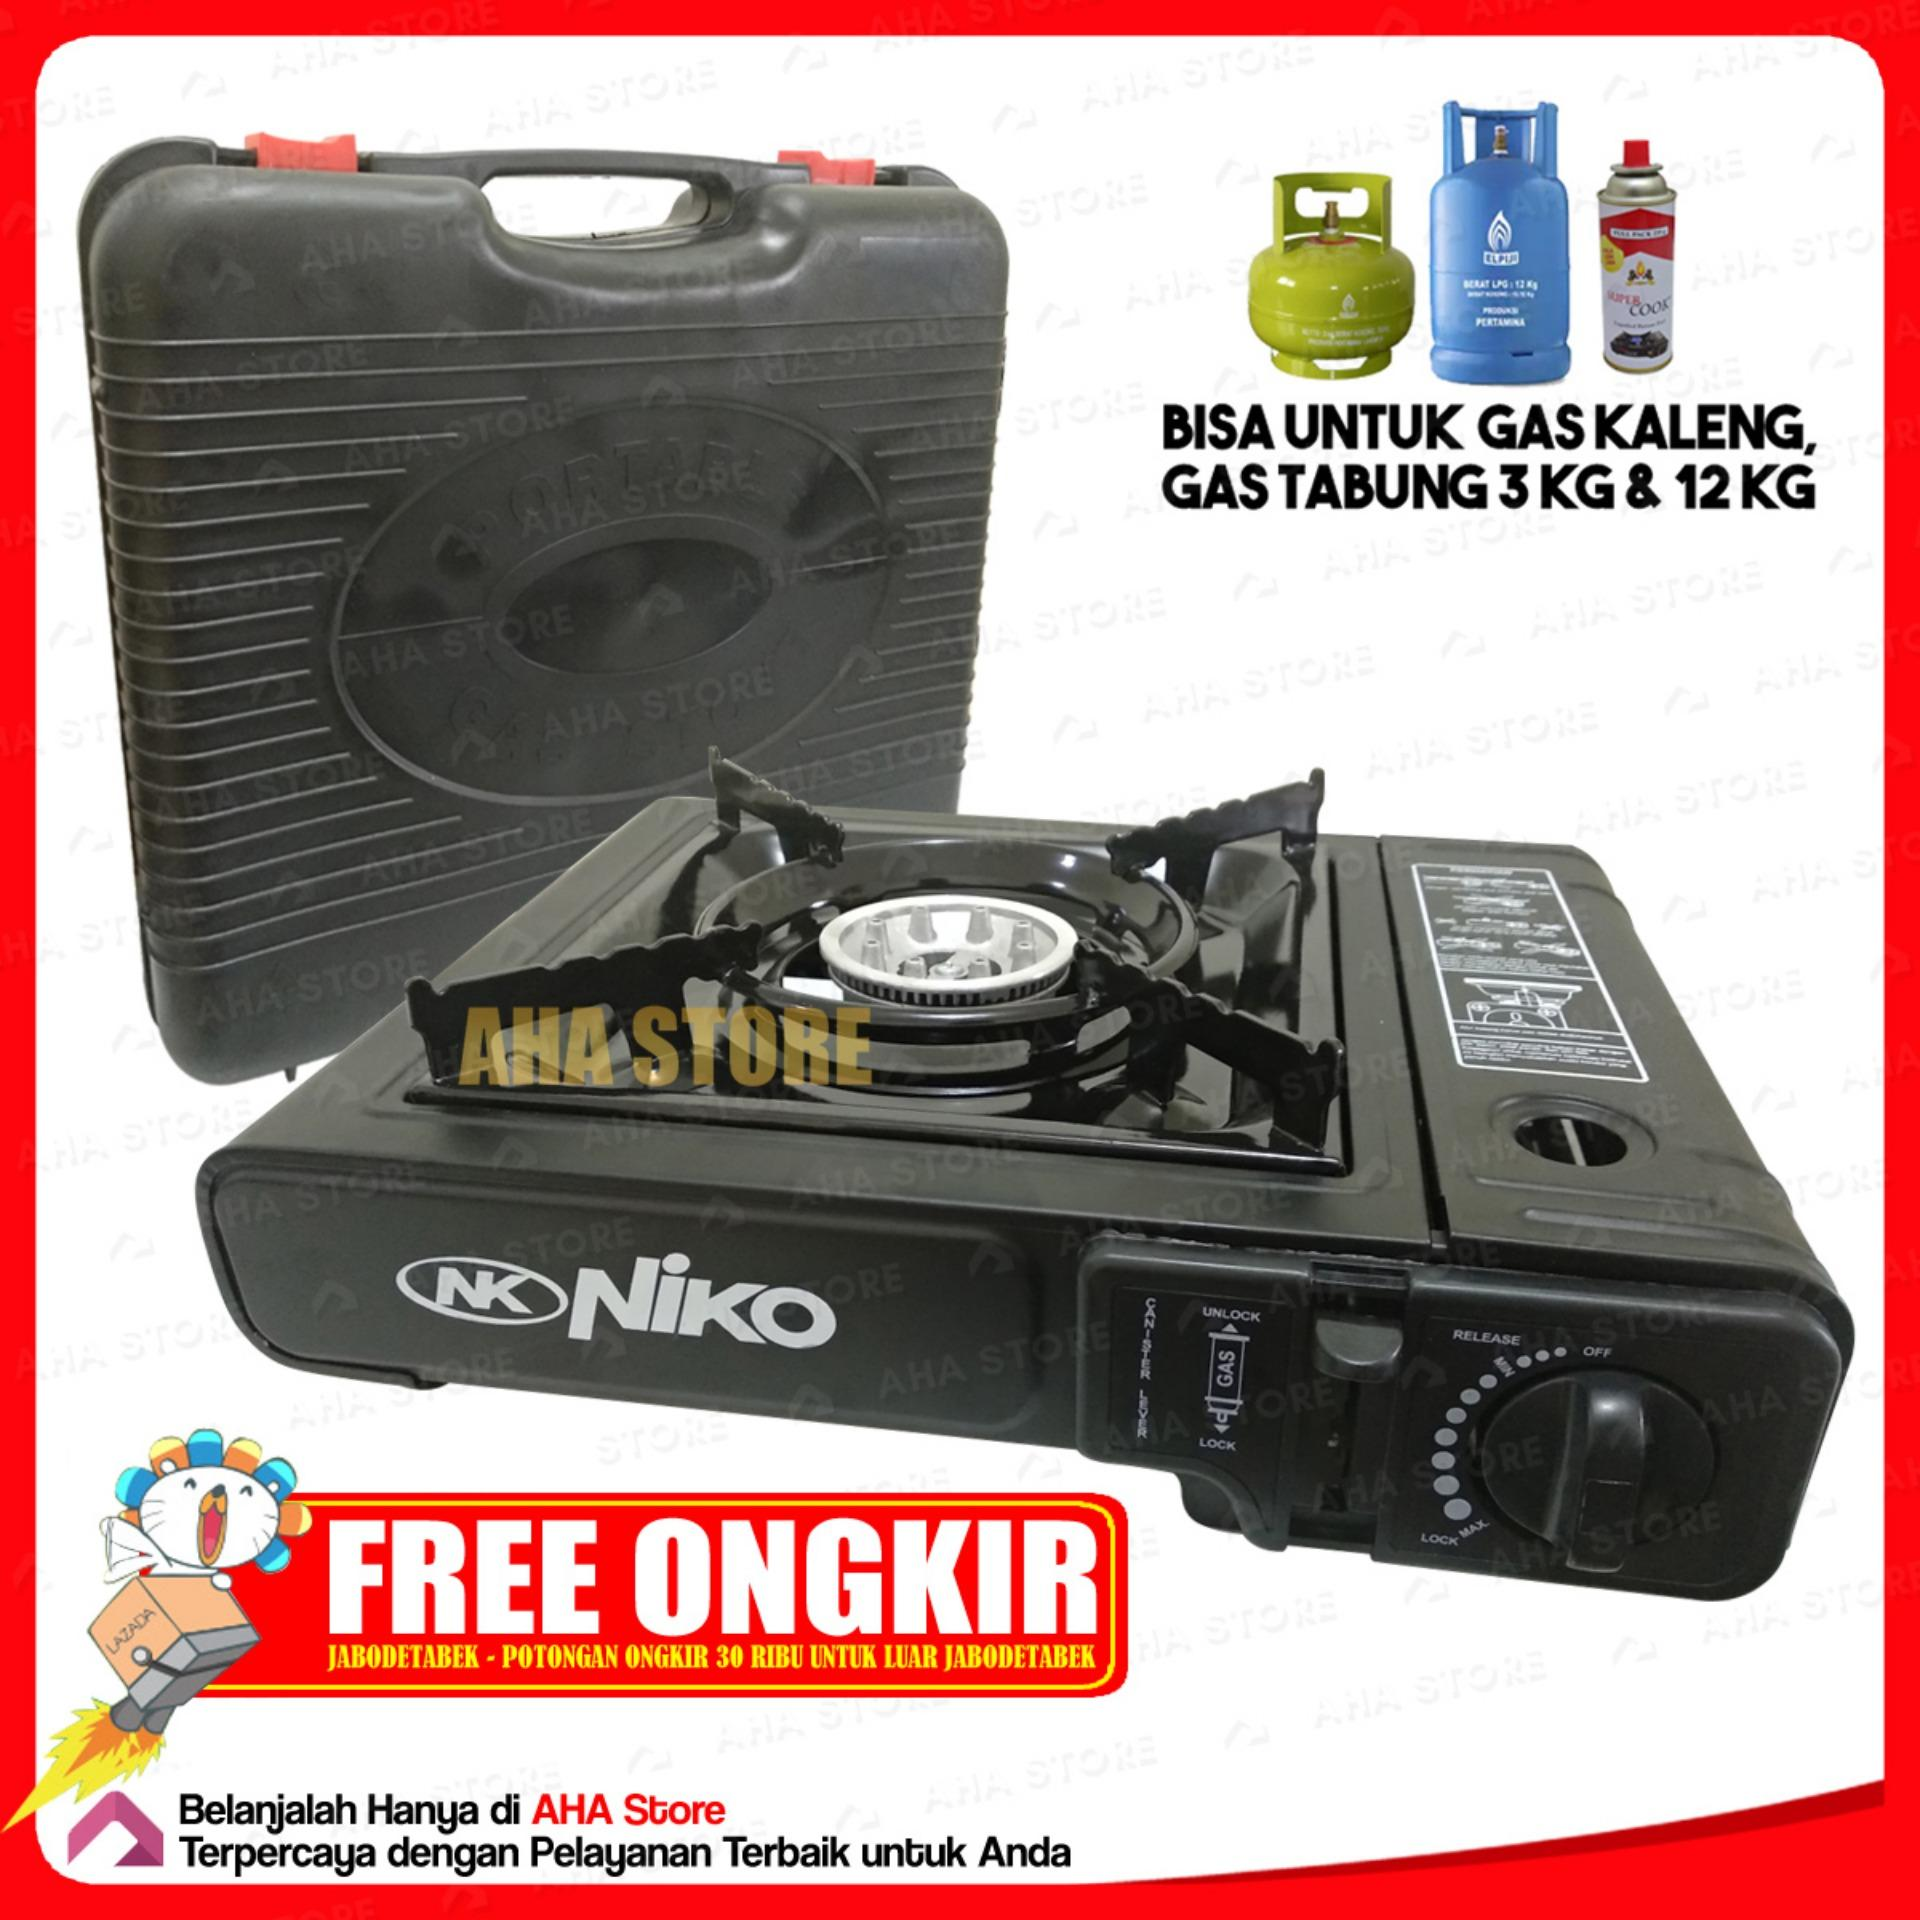 Kelebihan Niko Kompor Gas Satu Tungku Nk 1sn Stainless Silver Surabi Serabi 5 Portable 2 In 1 268